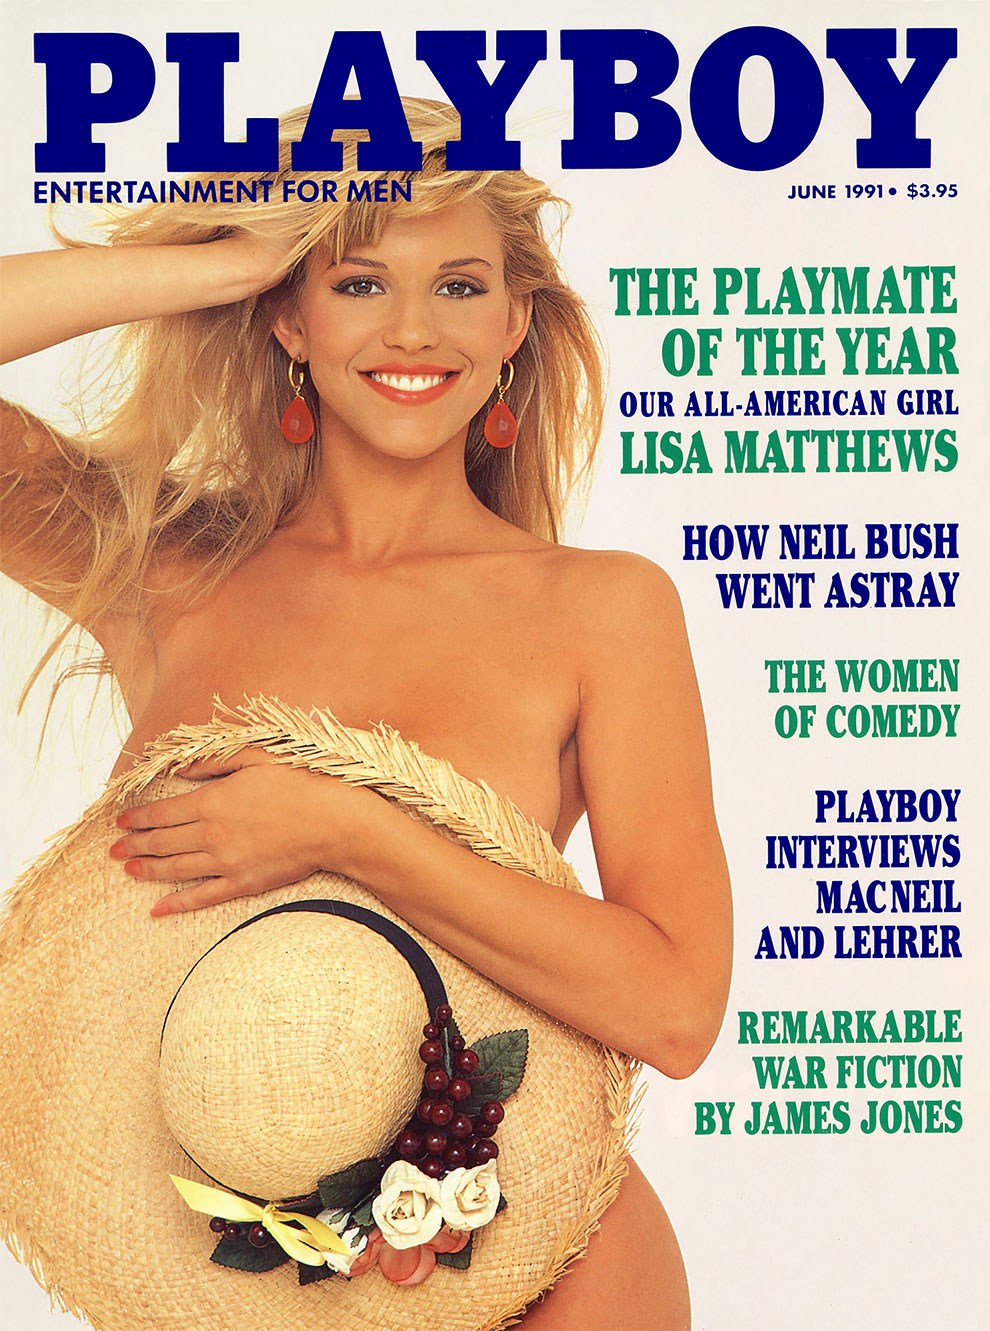 Playboy Playmates 30 anos despues 13